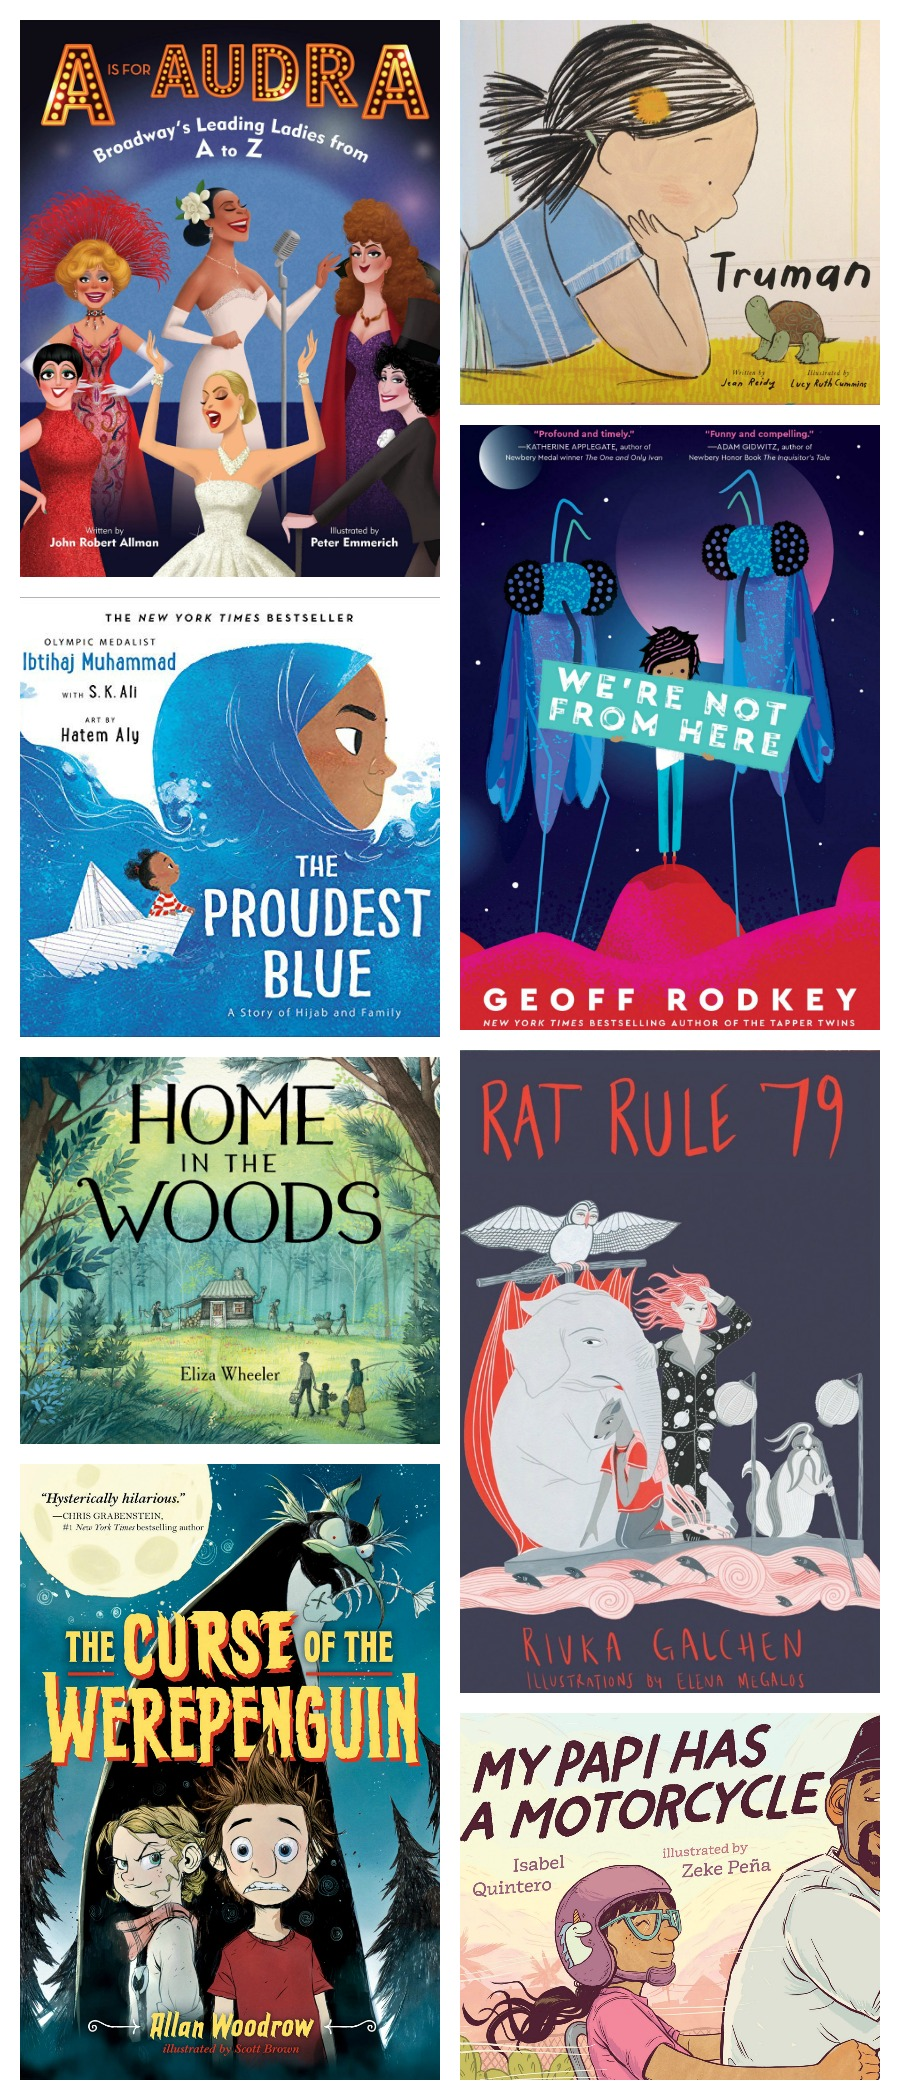 Best children's books of 2019: NPR's best children's books picks